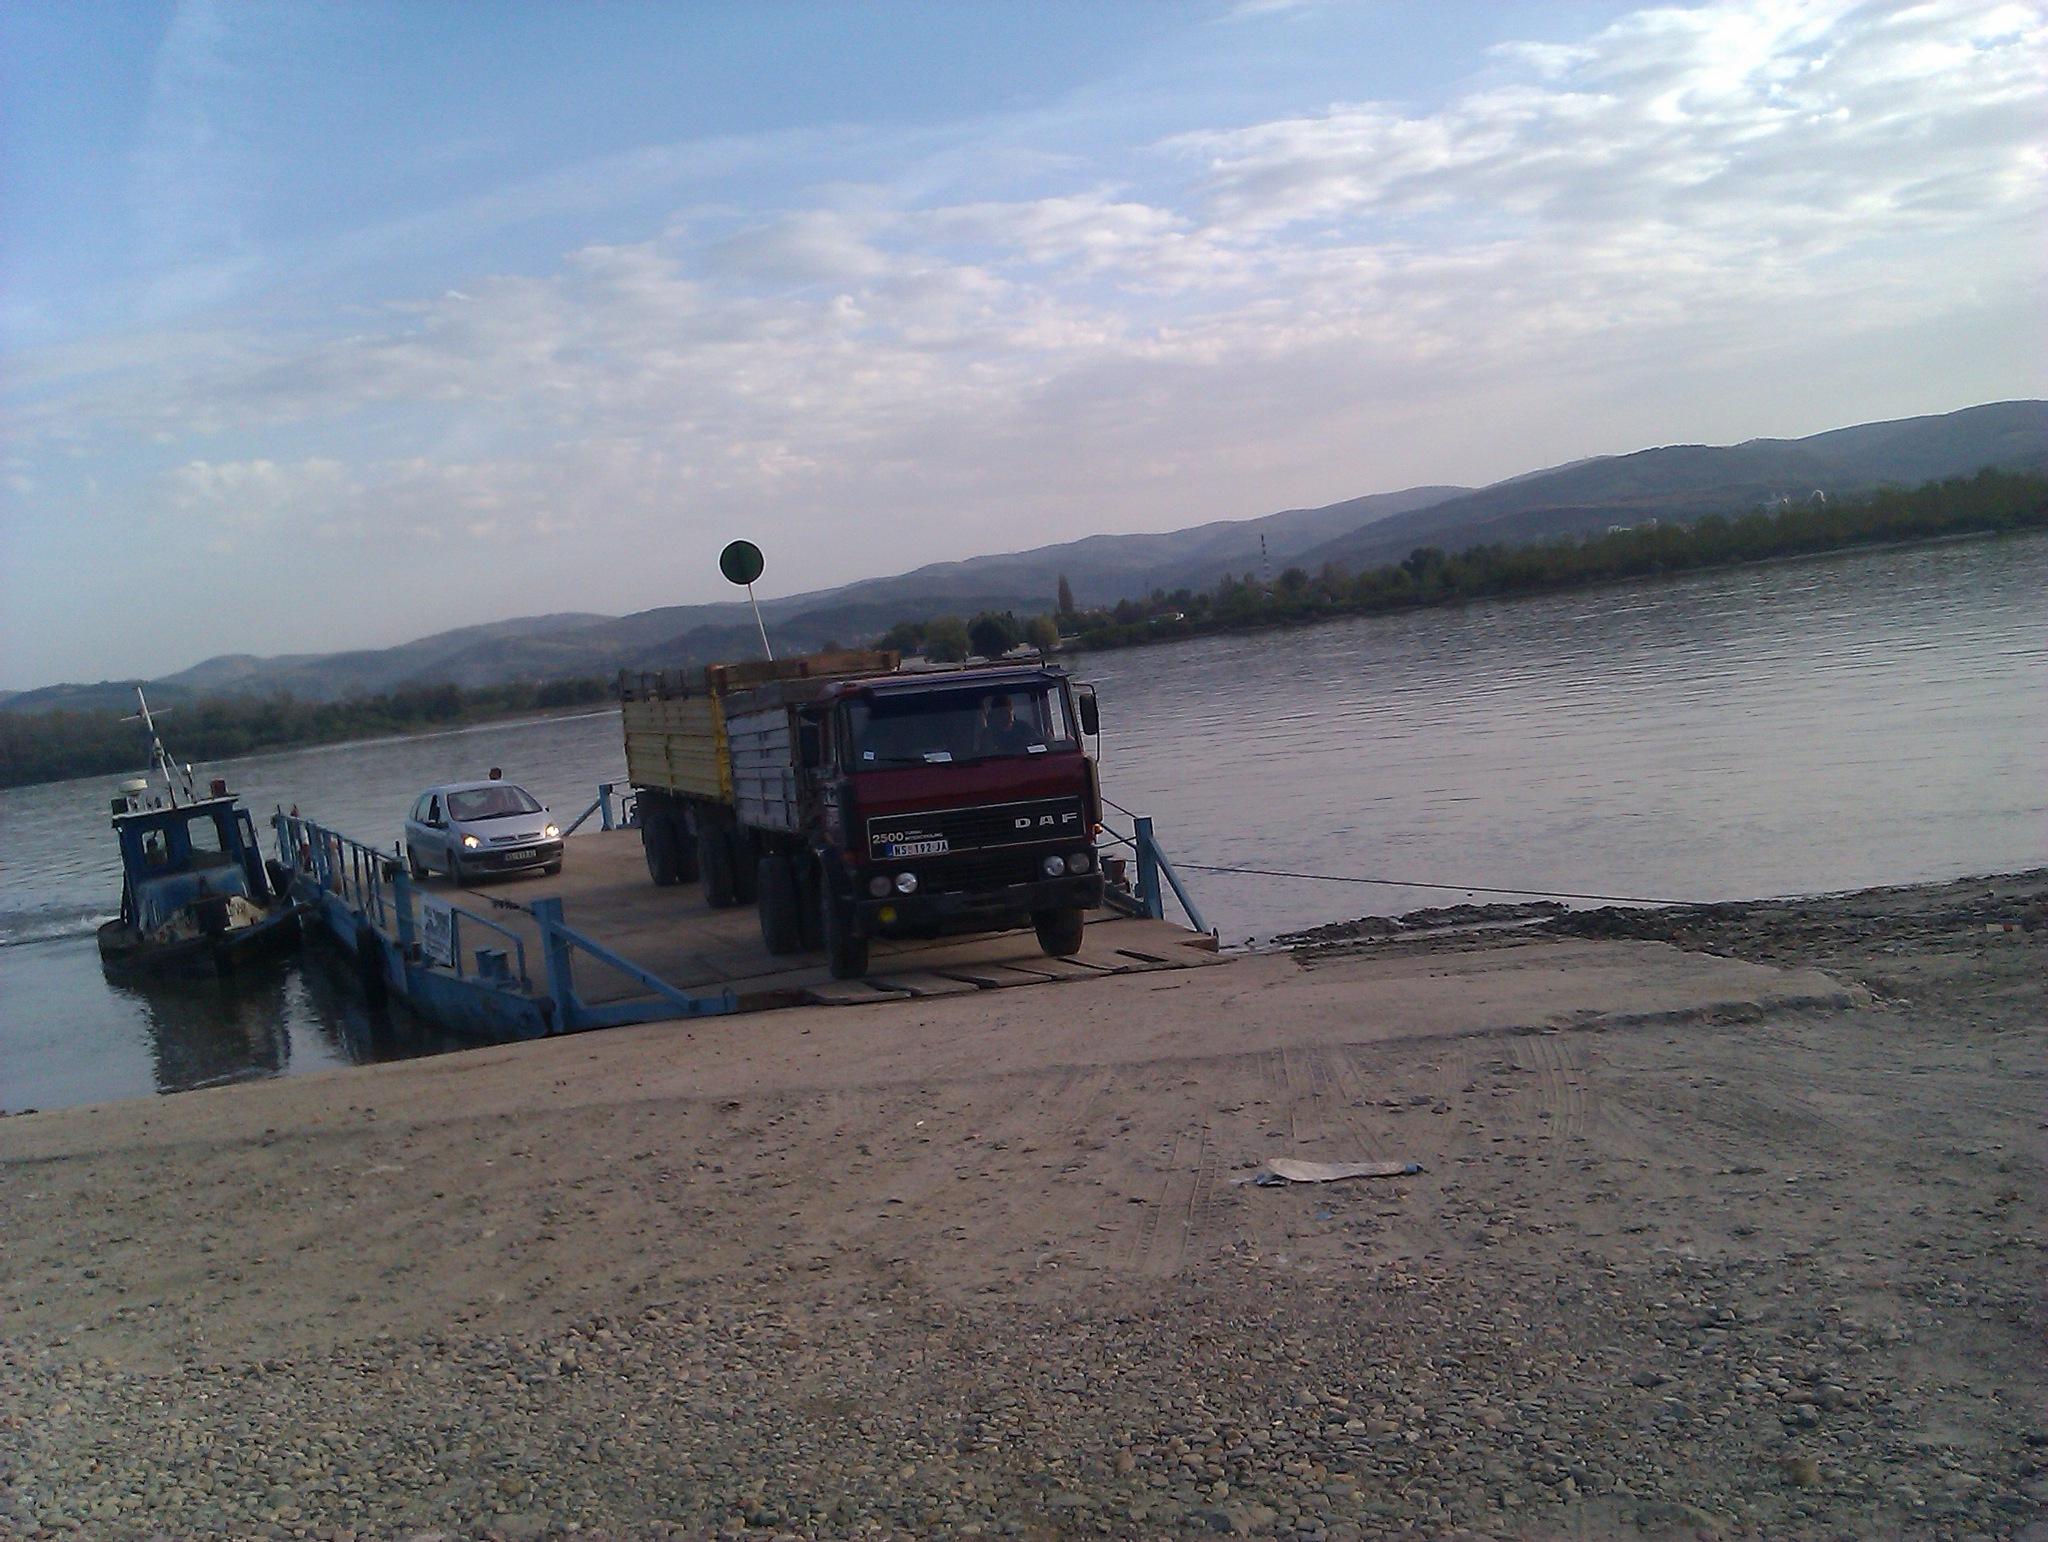 Disembark 1 by Geigercounterculture